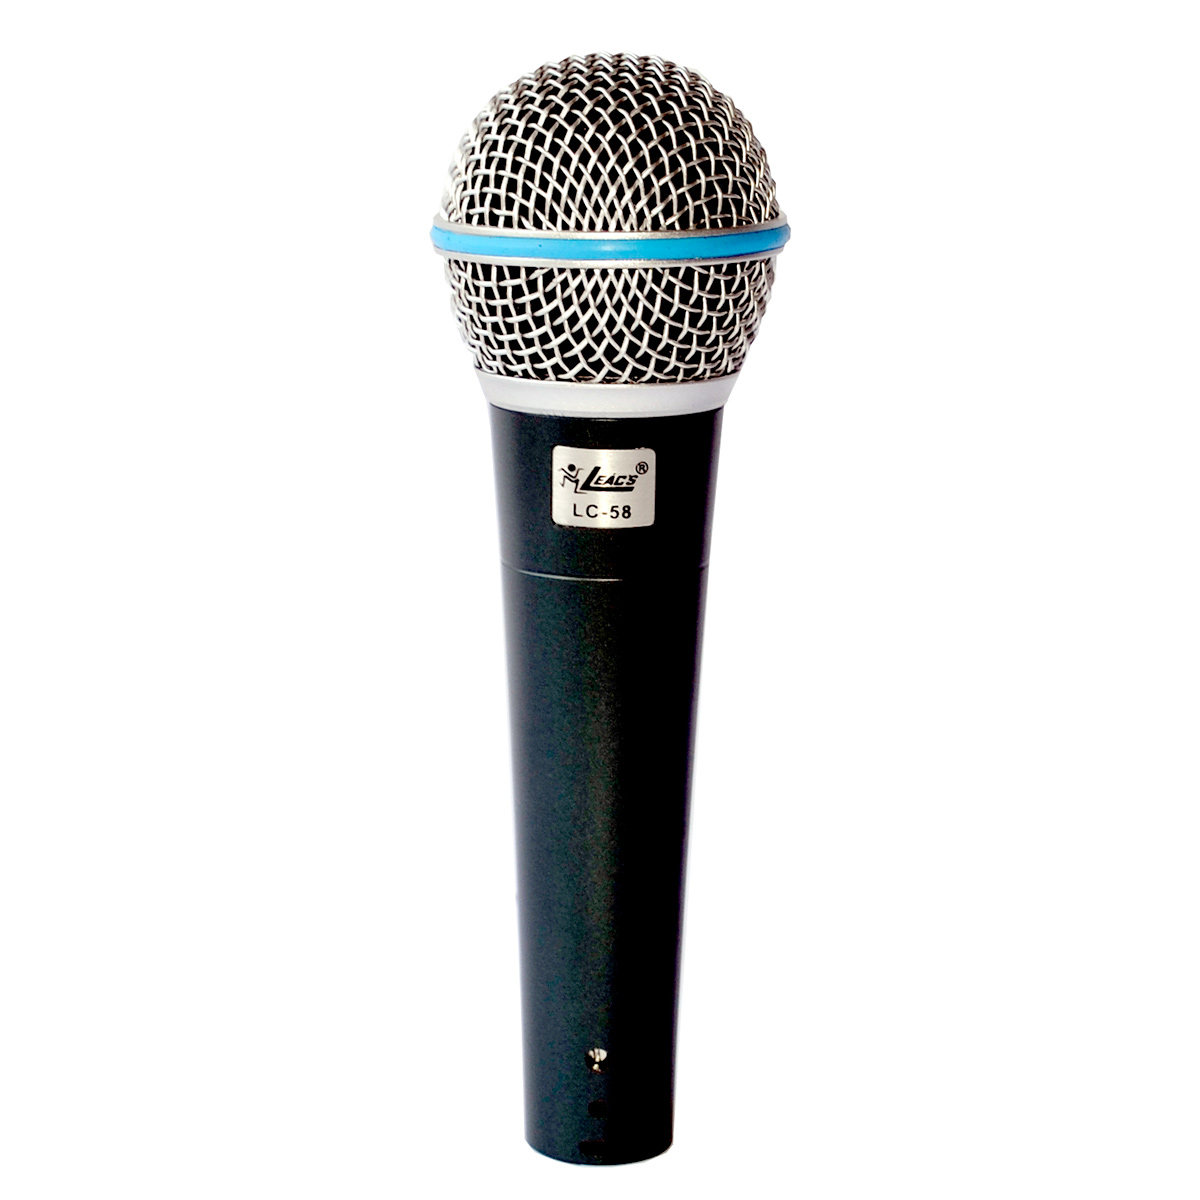 LC58 - Microfone c/ Fio de Mão LC 58 - Leacs